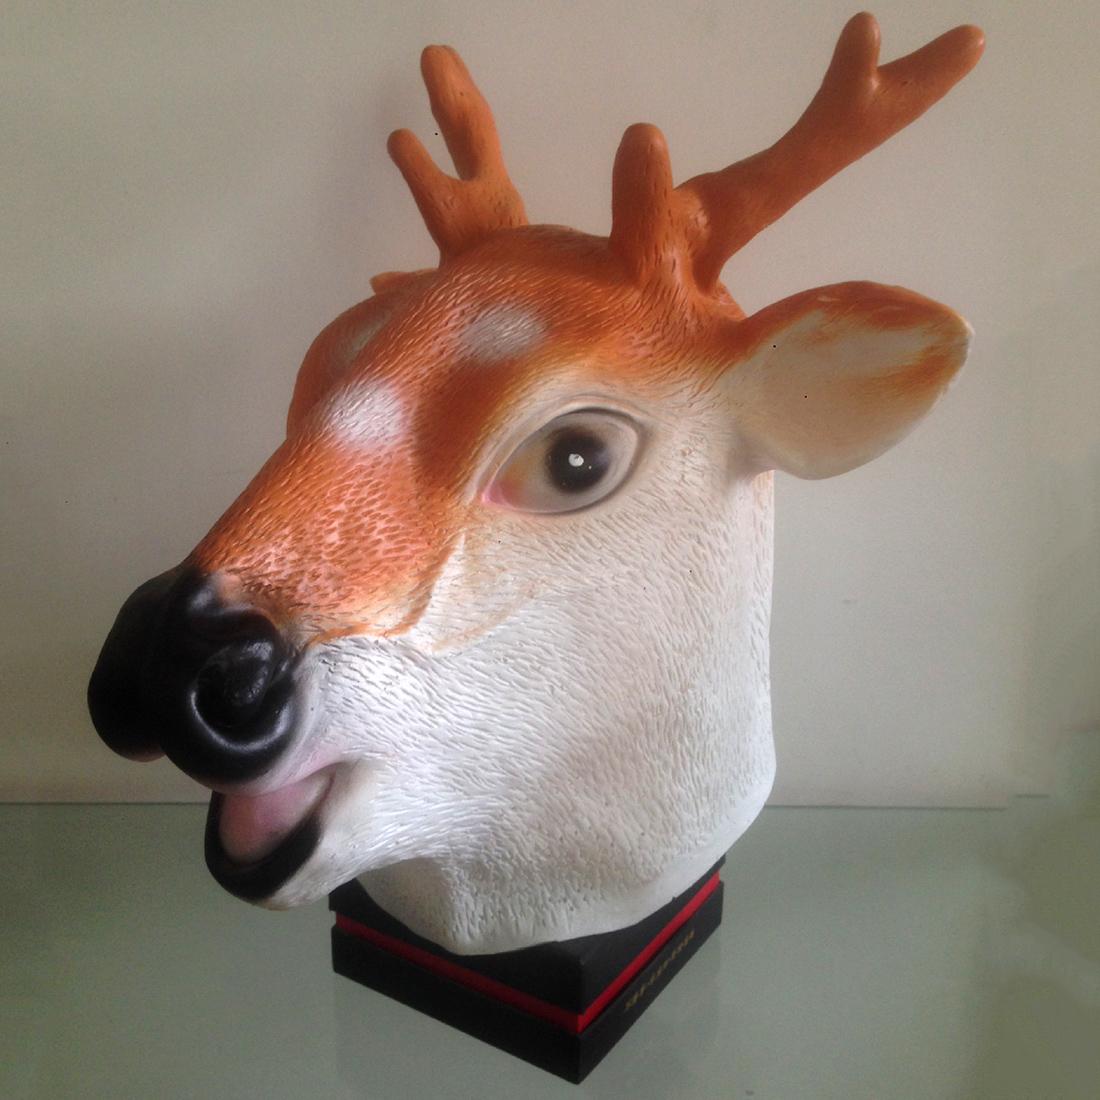 Latex Giraffe Full Head Mask Cospaly Masquerade Dress Up Deer Carnival Halloween - Brown + White(China (Mainland))